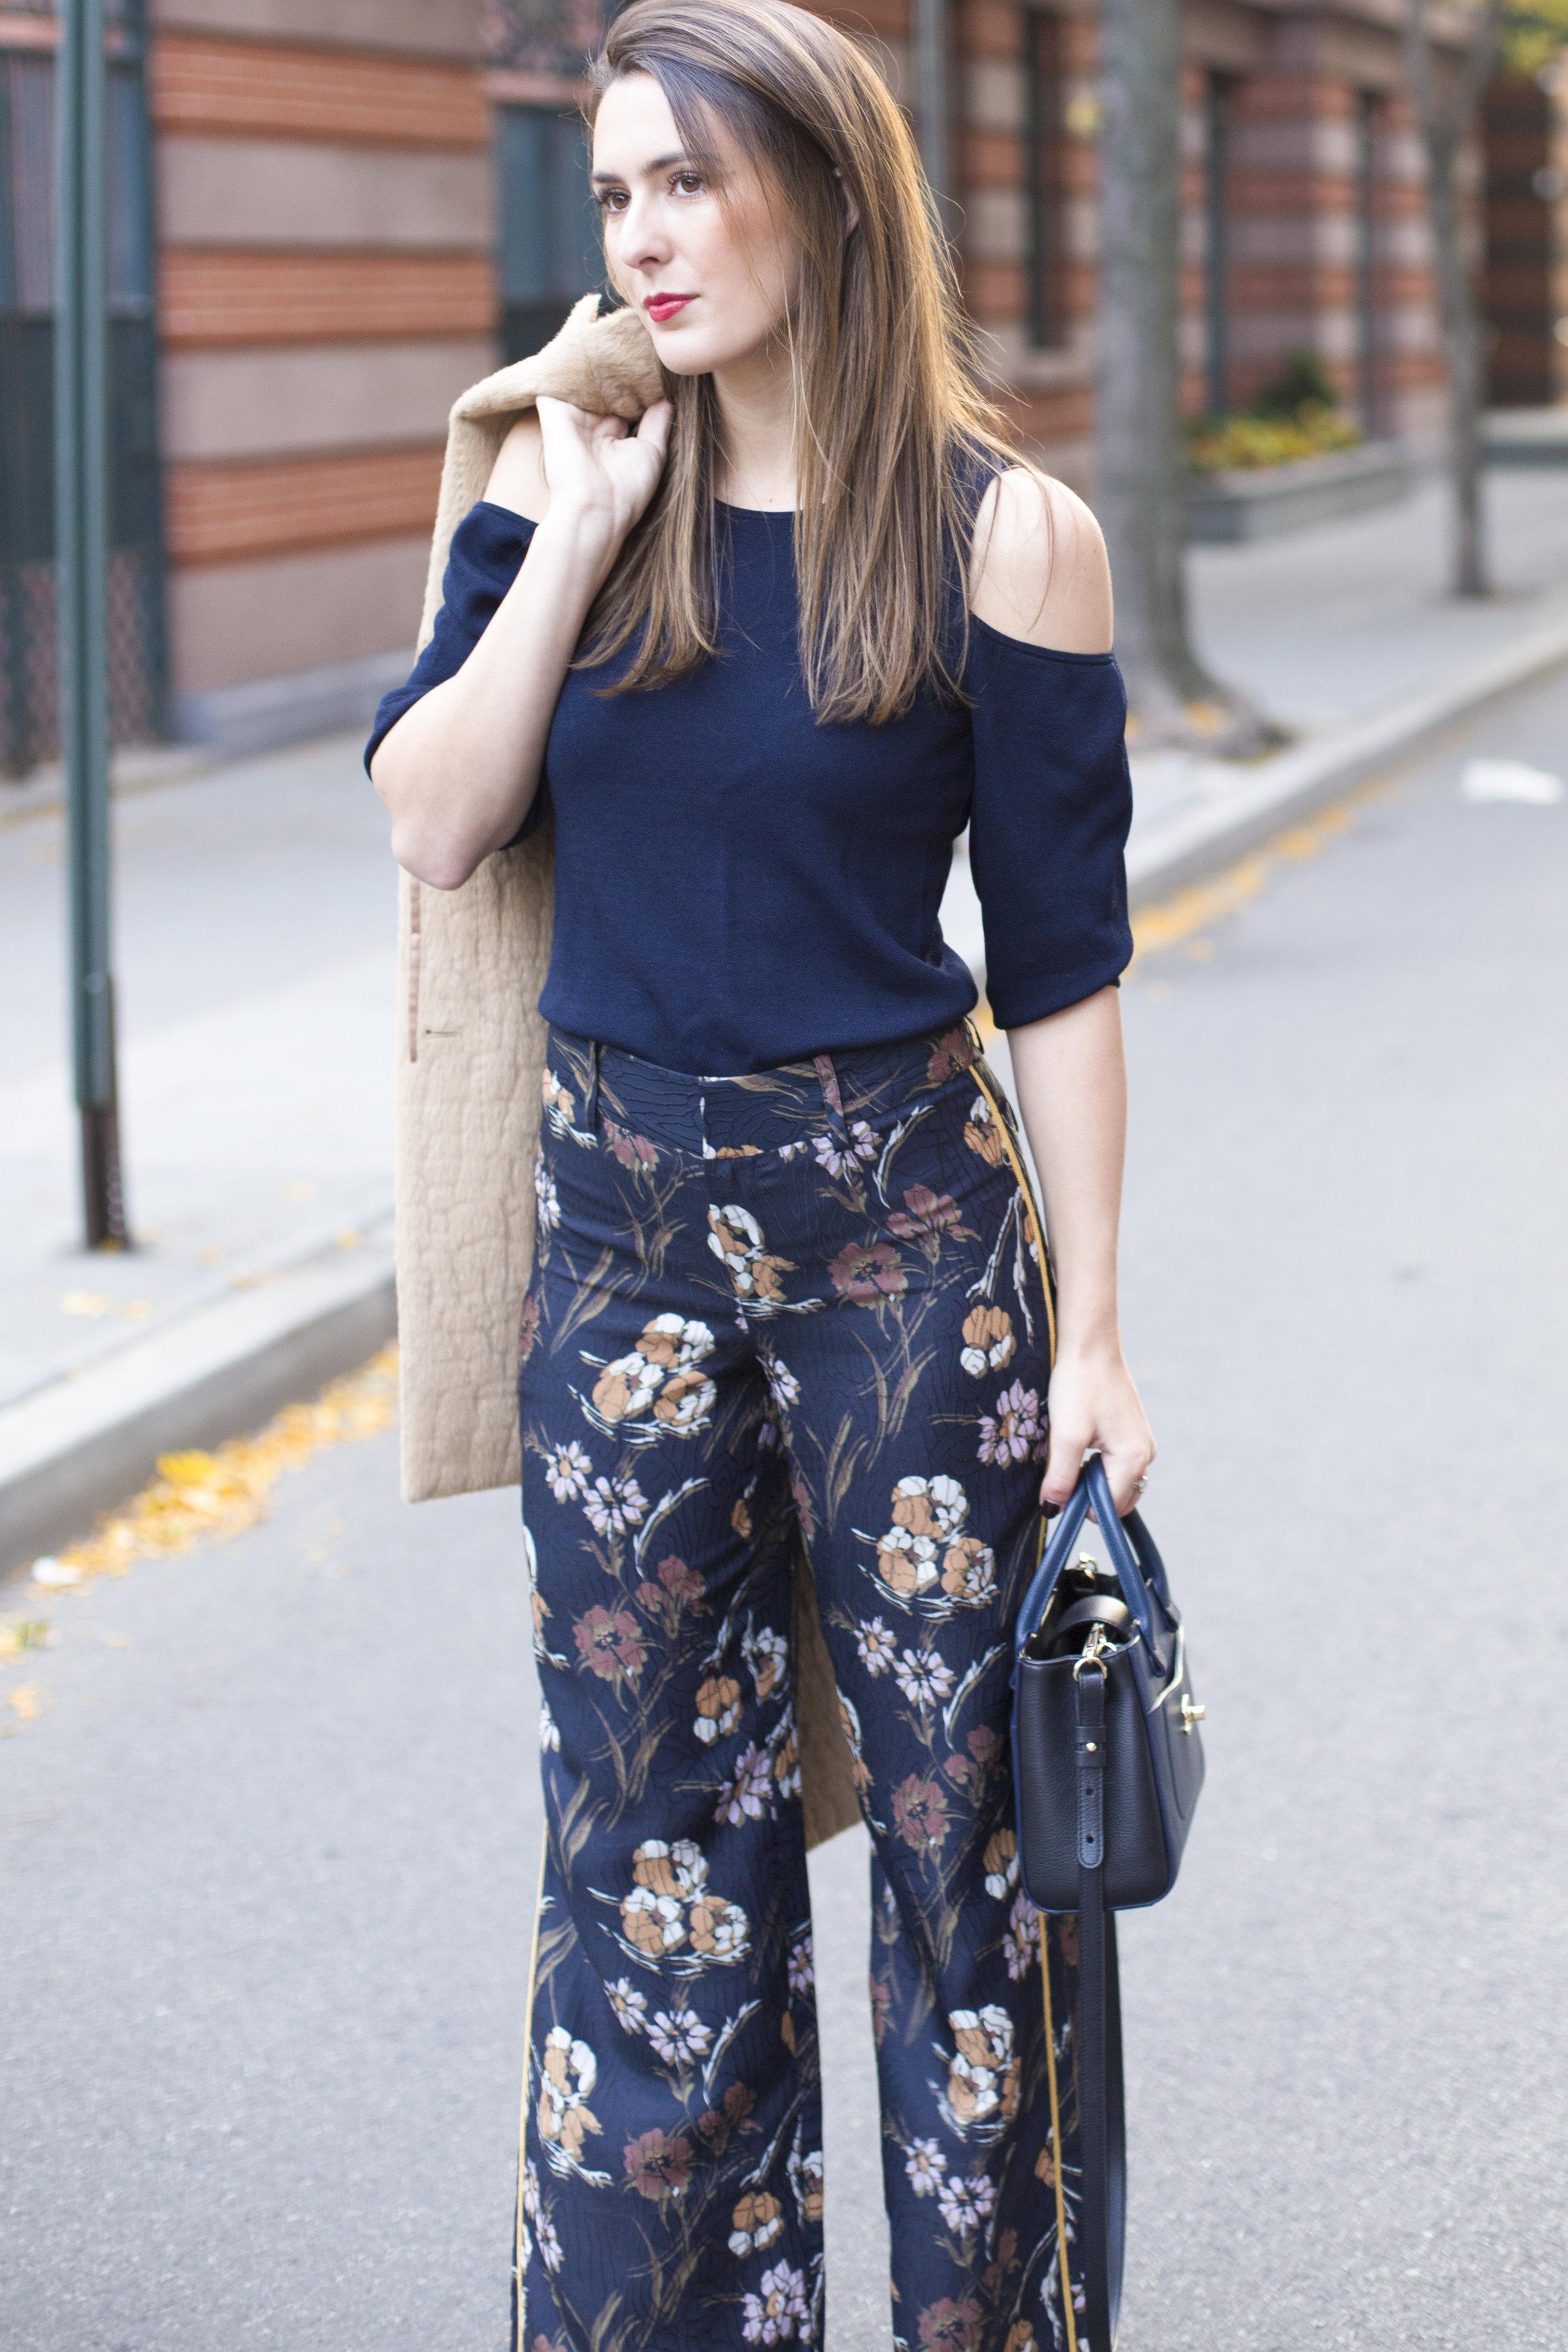 fashion blogger photographer.JPG